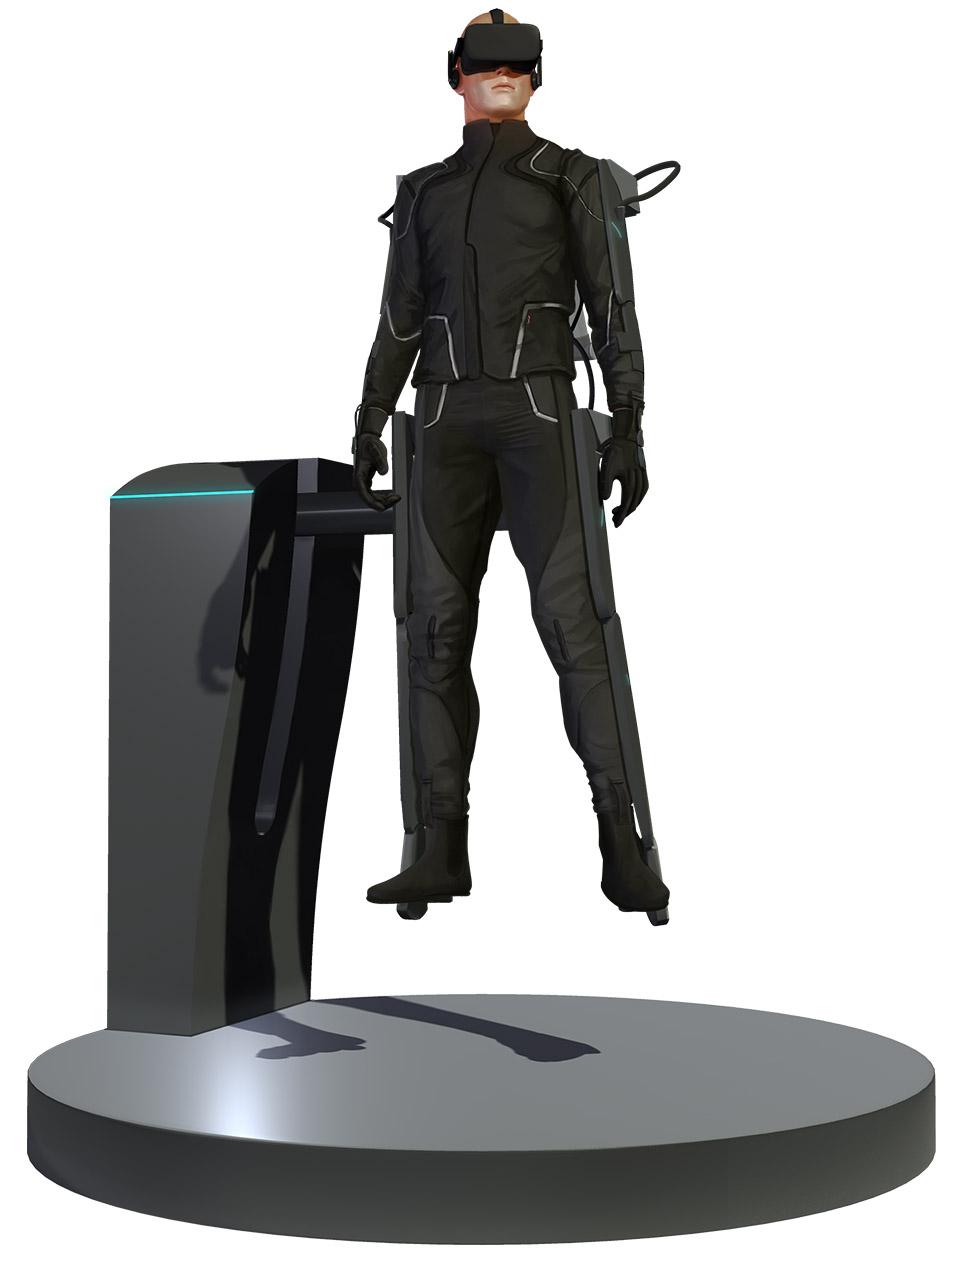 AxonVR Immersive Platform